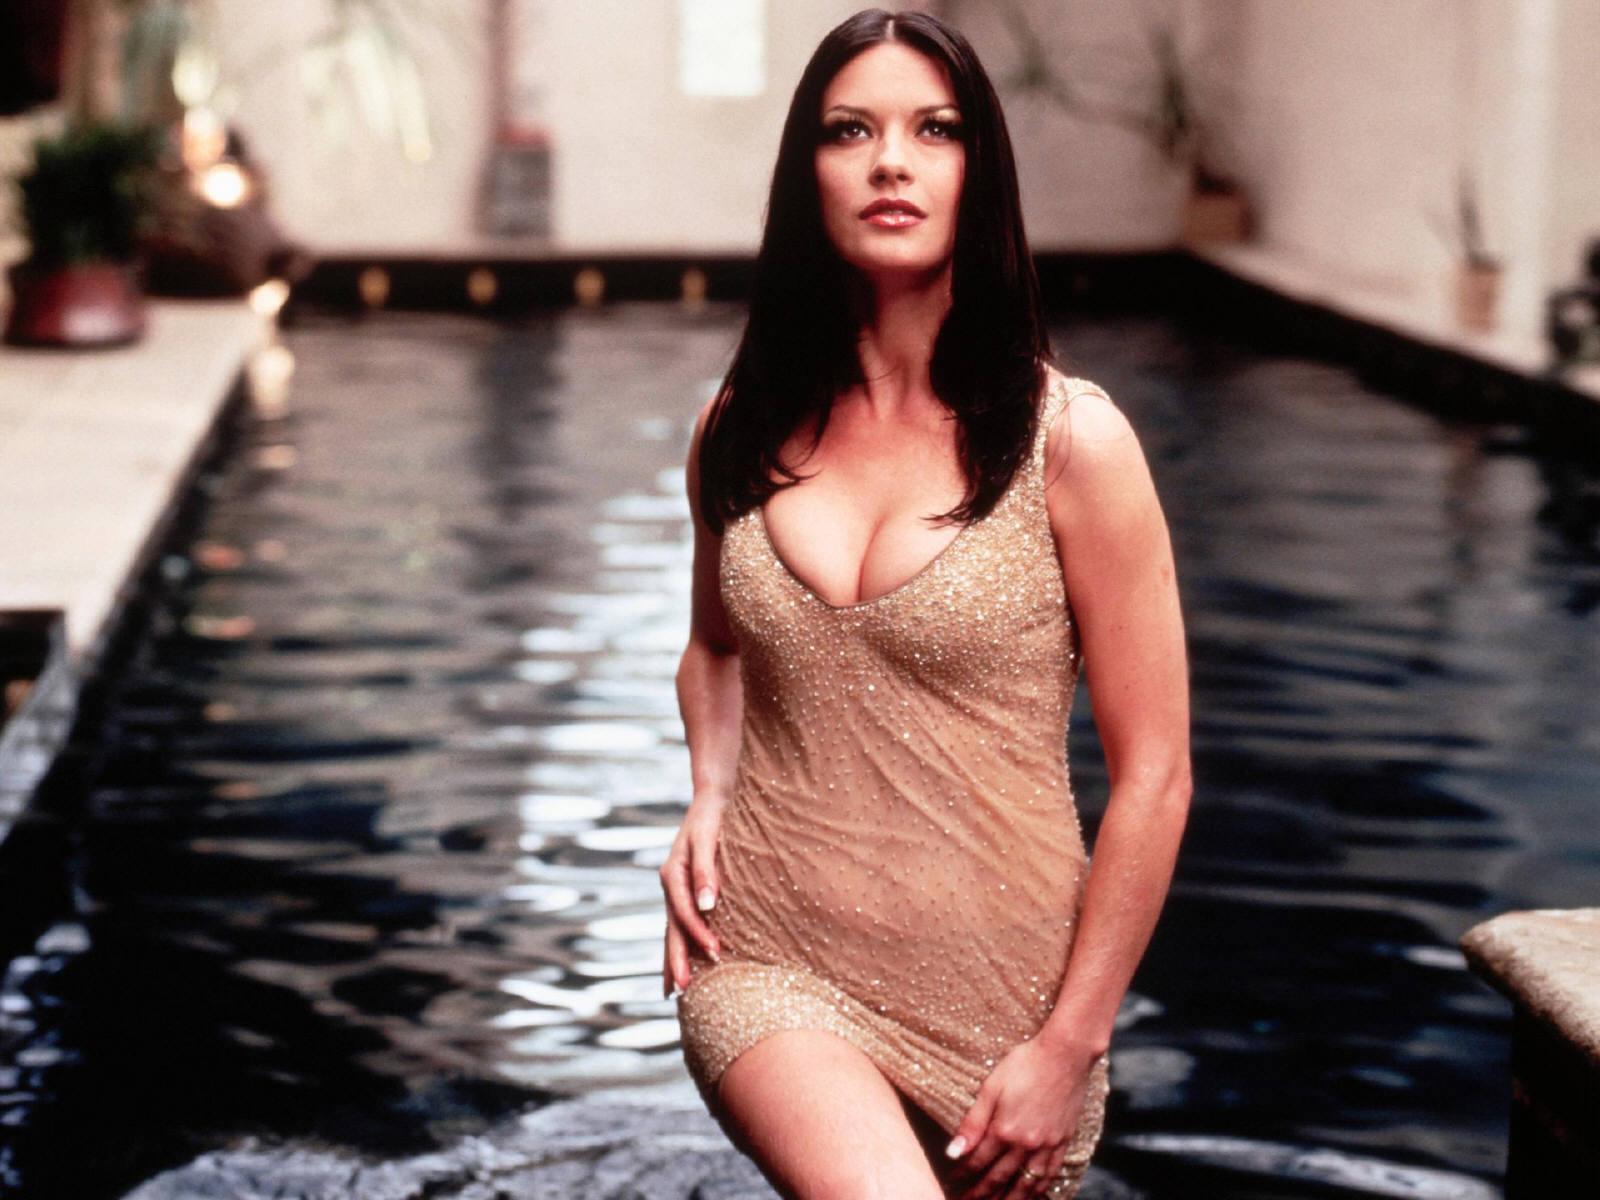 http://2.bp.blogspot.com/-BPpV6UHEQrU/ThGaSsabNAI/AAAAAAAABy4/f6Xut6vr0yM/s1600/catherine-zeta-jones-british-actress.jpg